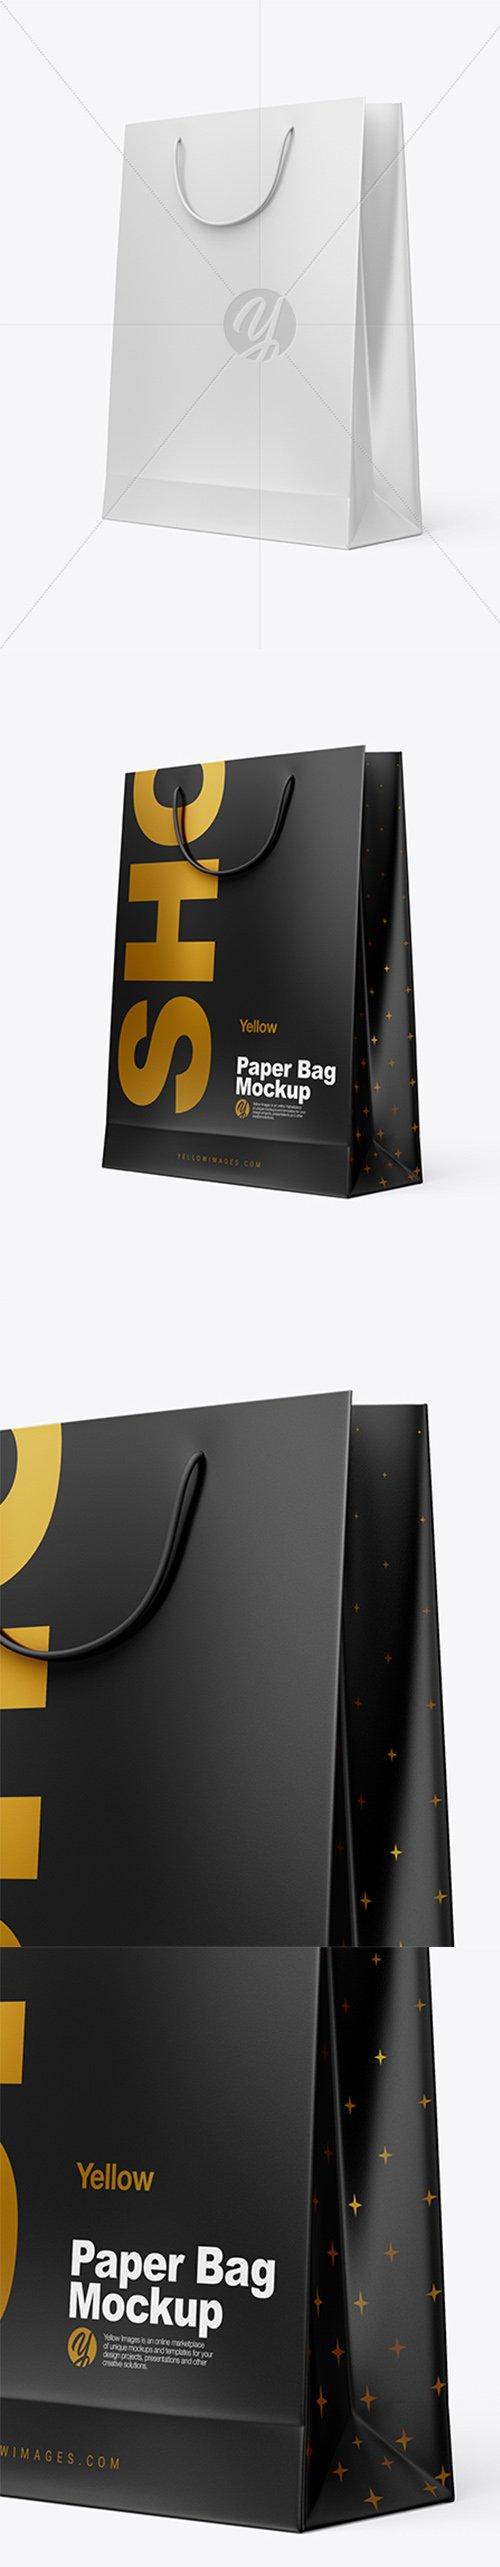 Matte Paper Shopping Bag Mockup - Half Side View 29279 TIF